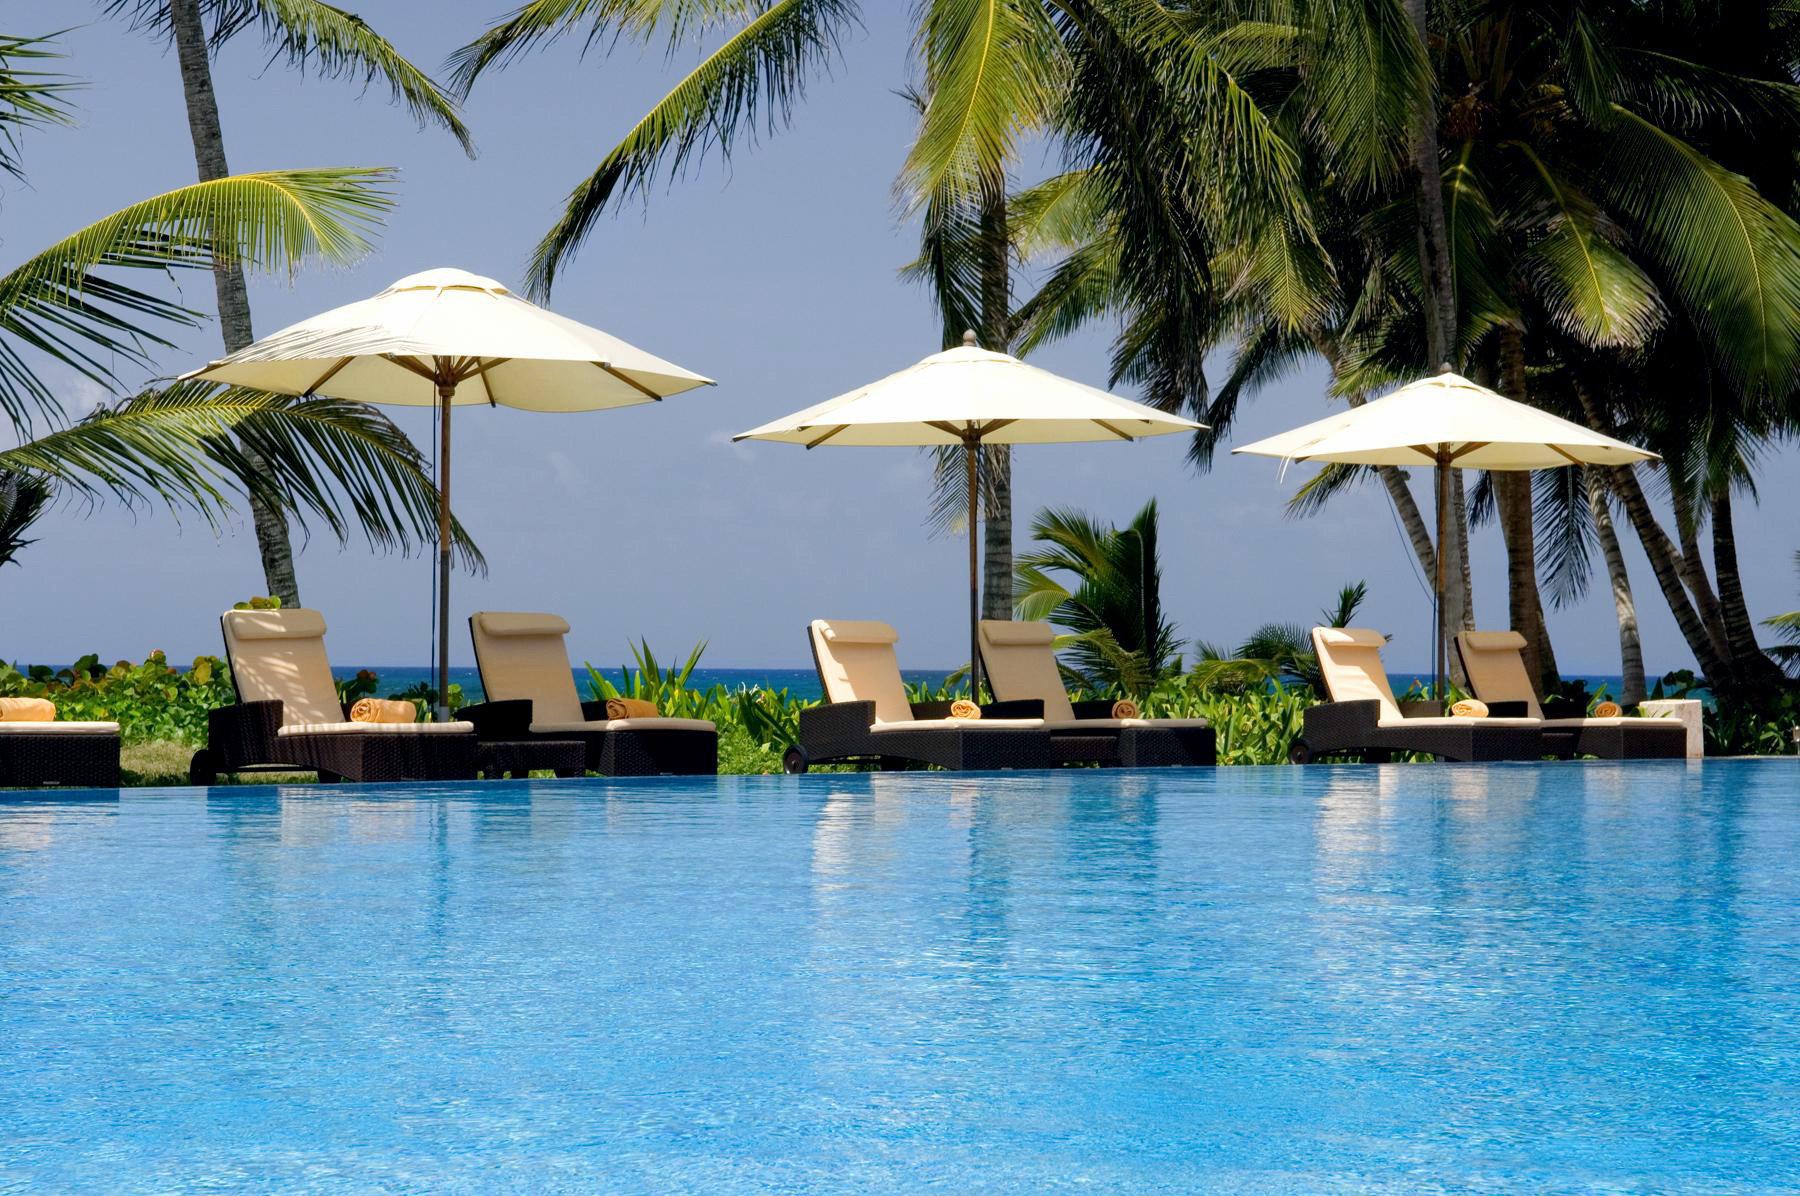 Adult-only All-inclusive Honeymoon Pool Romance tree water leisure swimming pool Resort caribbean arecales Ocean Sea Lagoon Villa Beach tropics lined